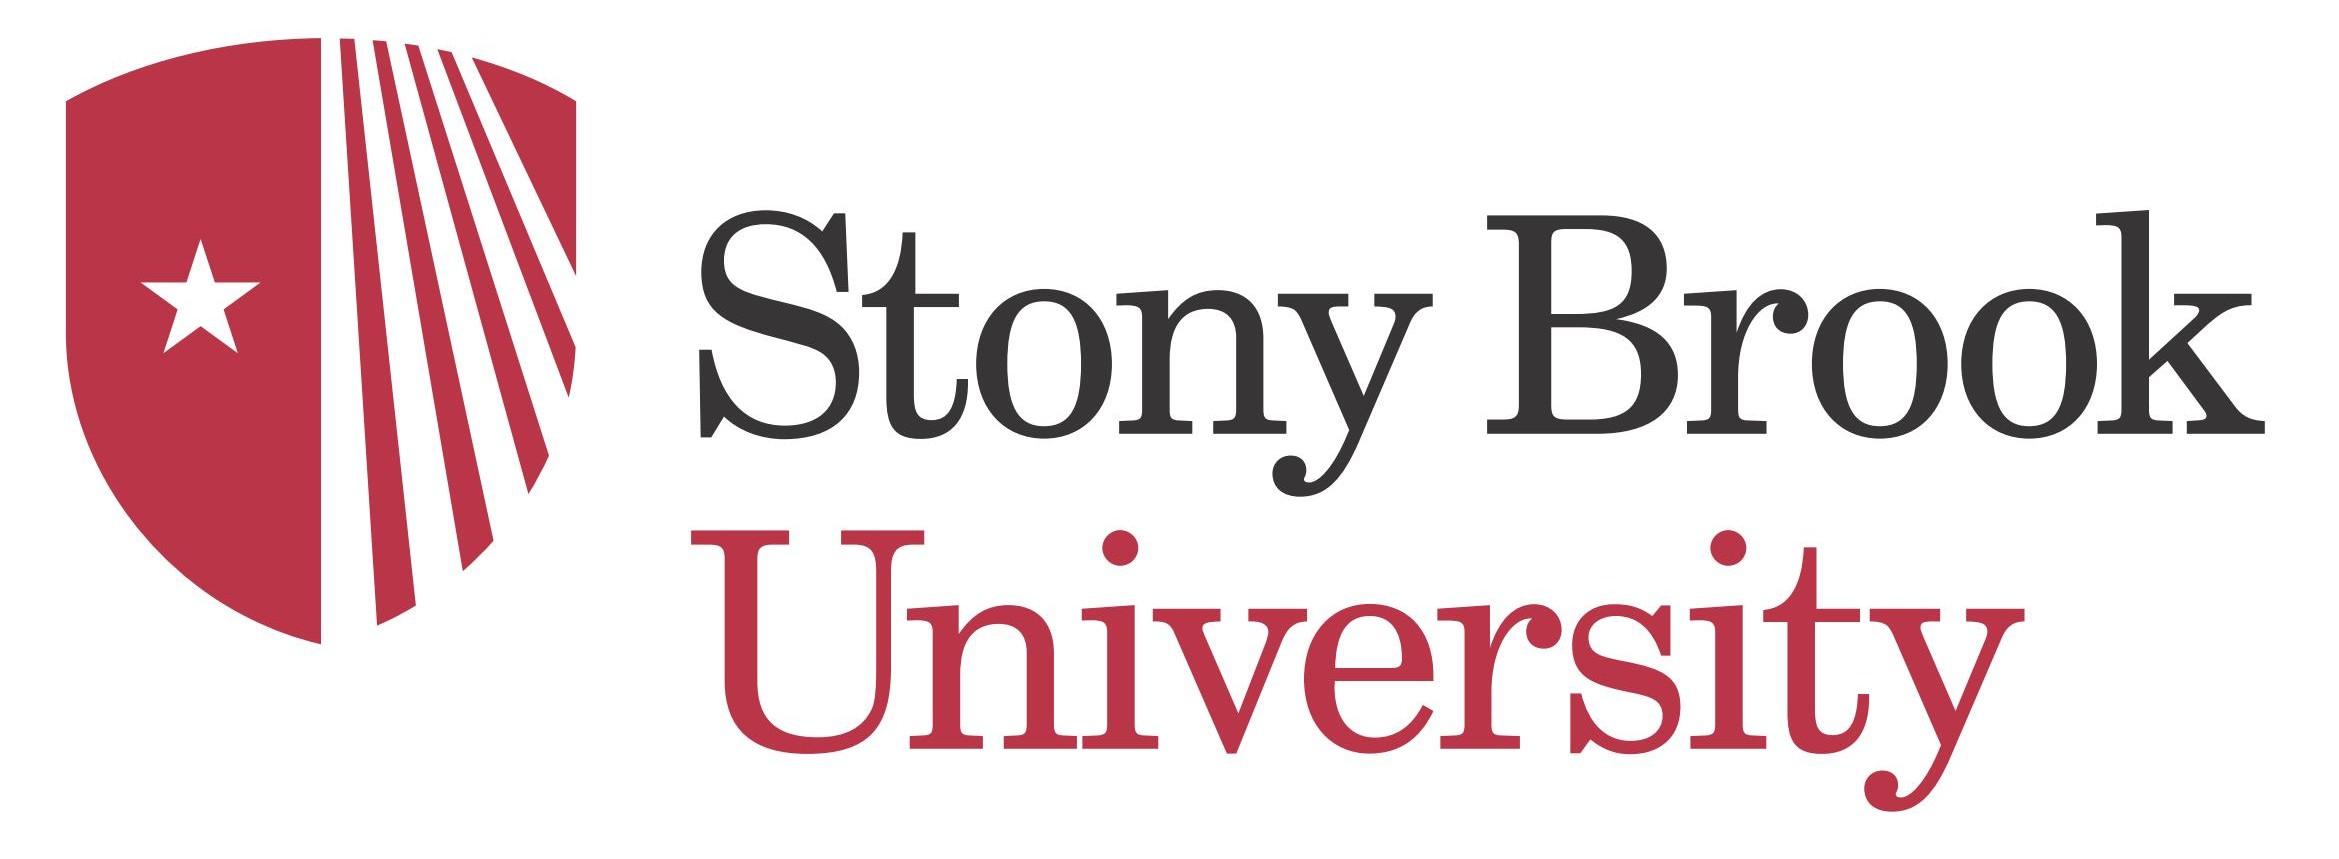 Stony-Brook-University-logo.jpg